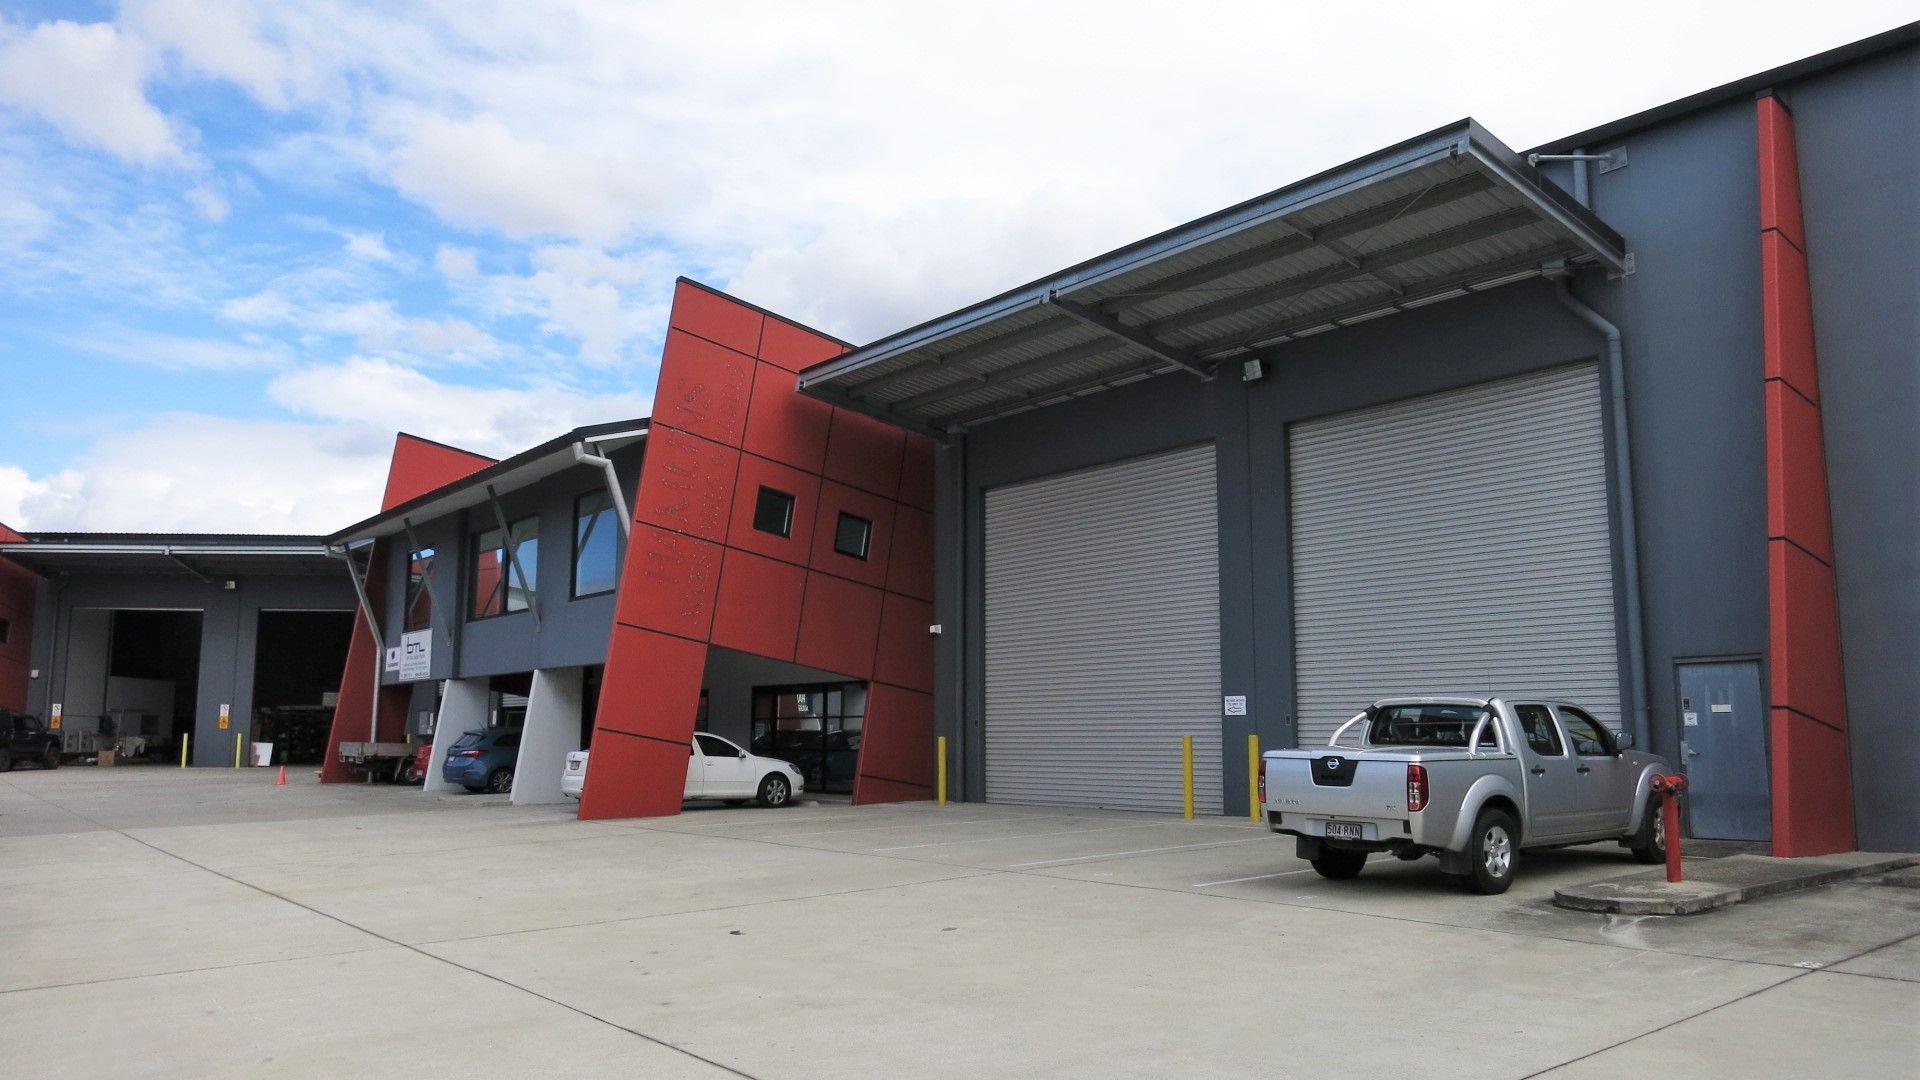 735m² Warehouse in Geebung's Standout Complex